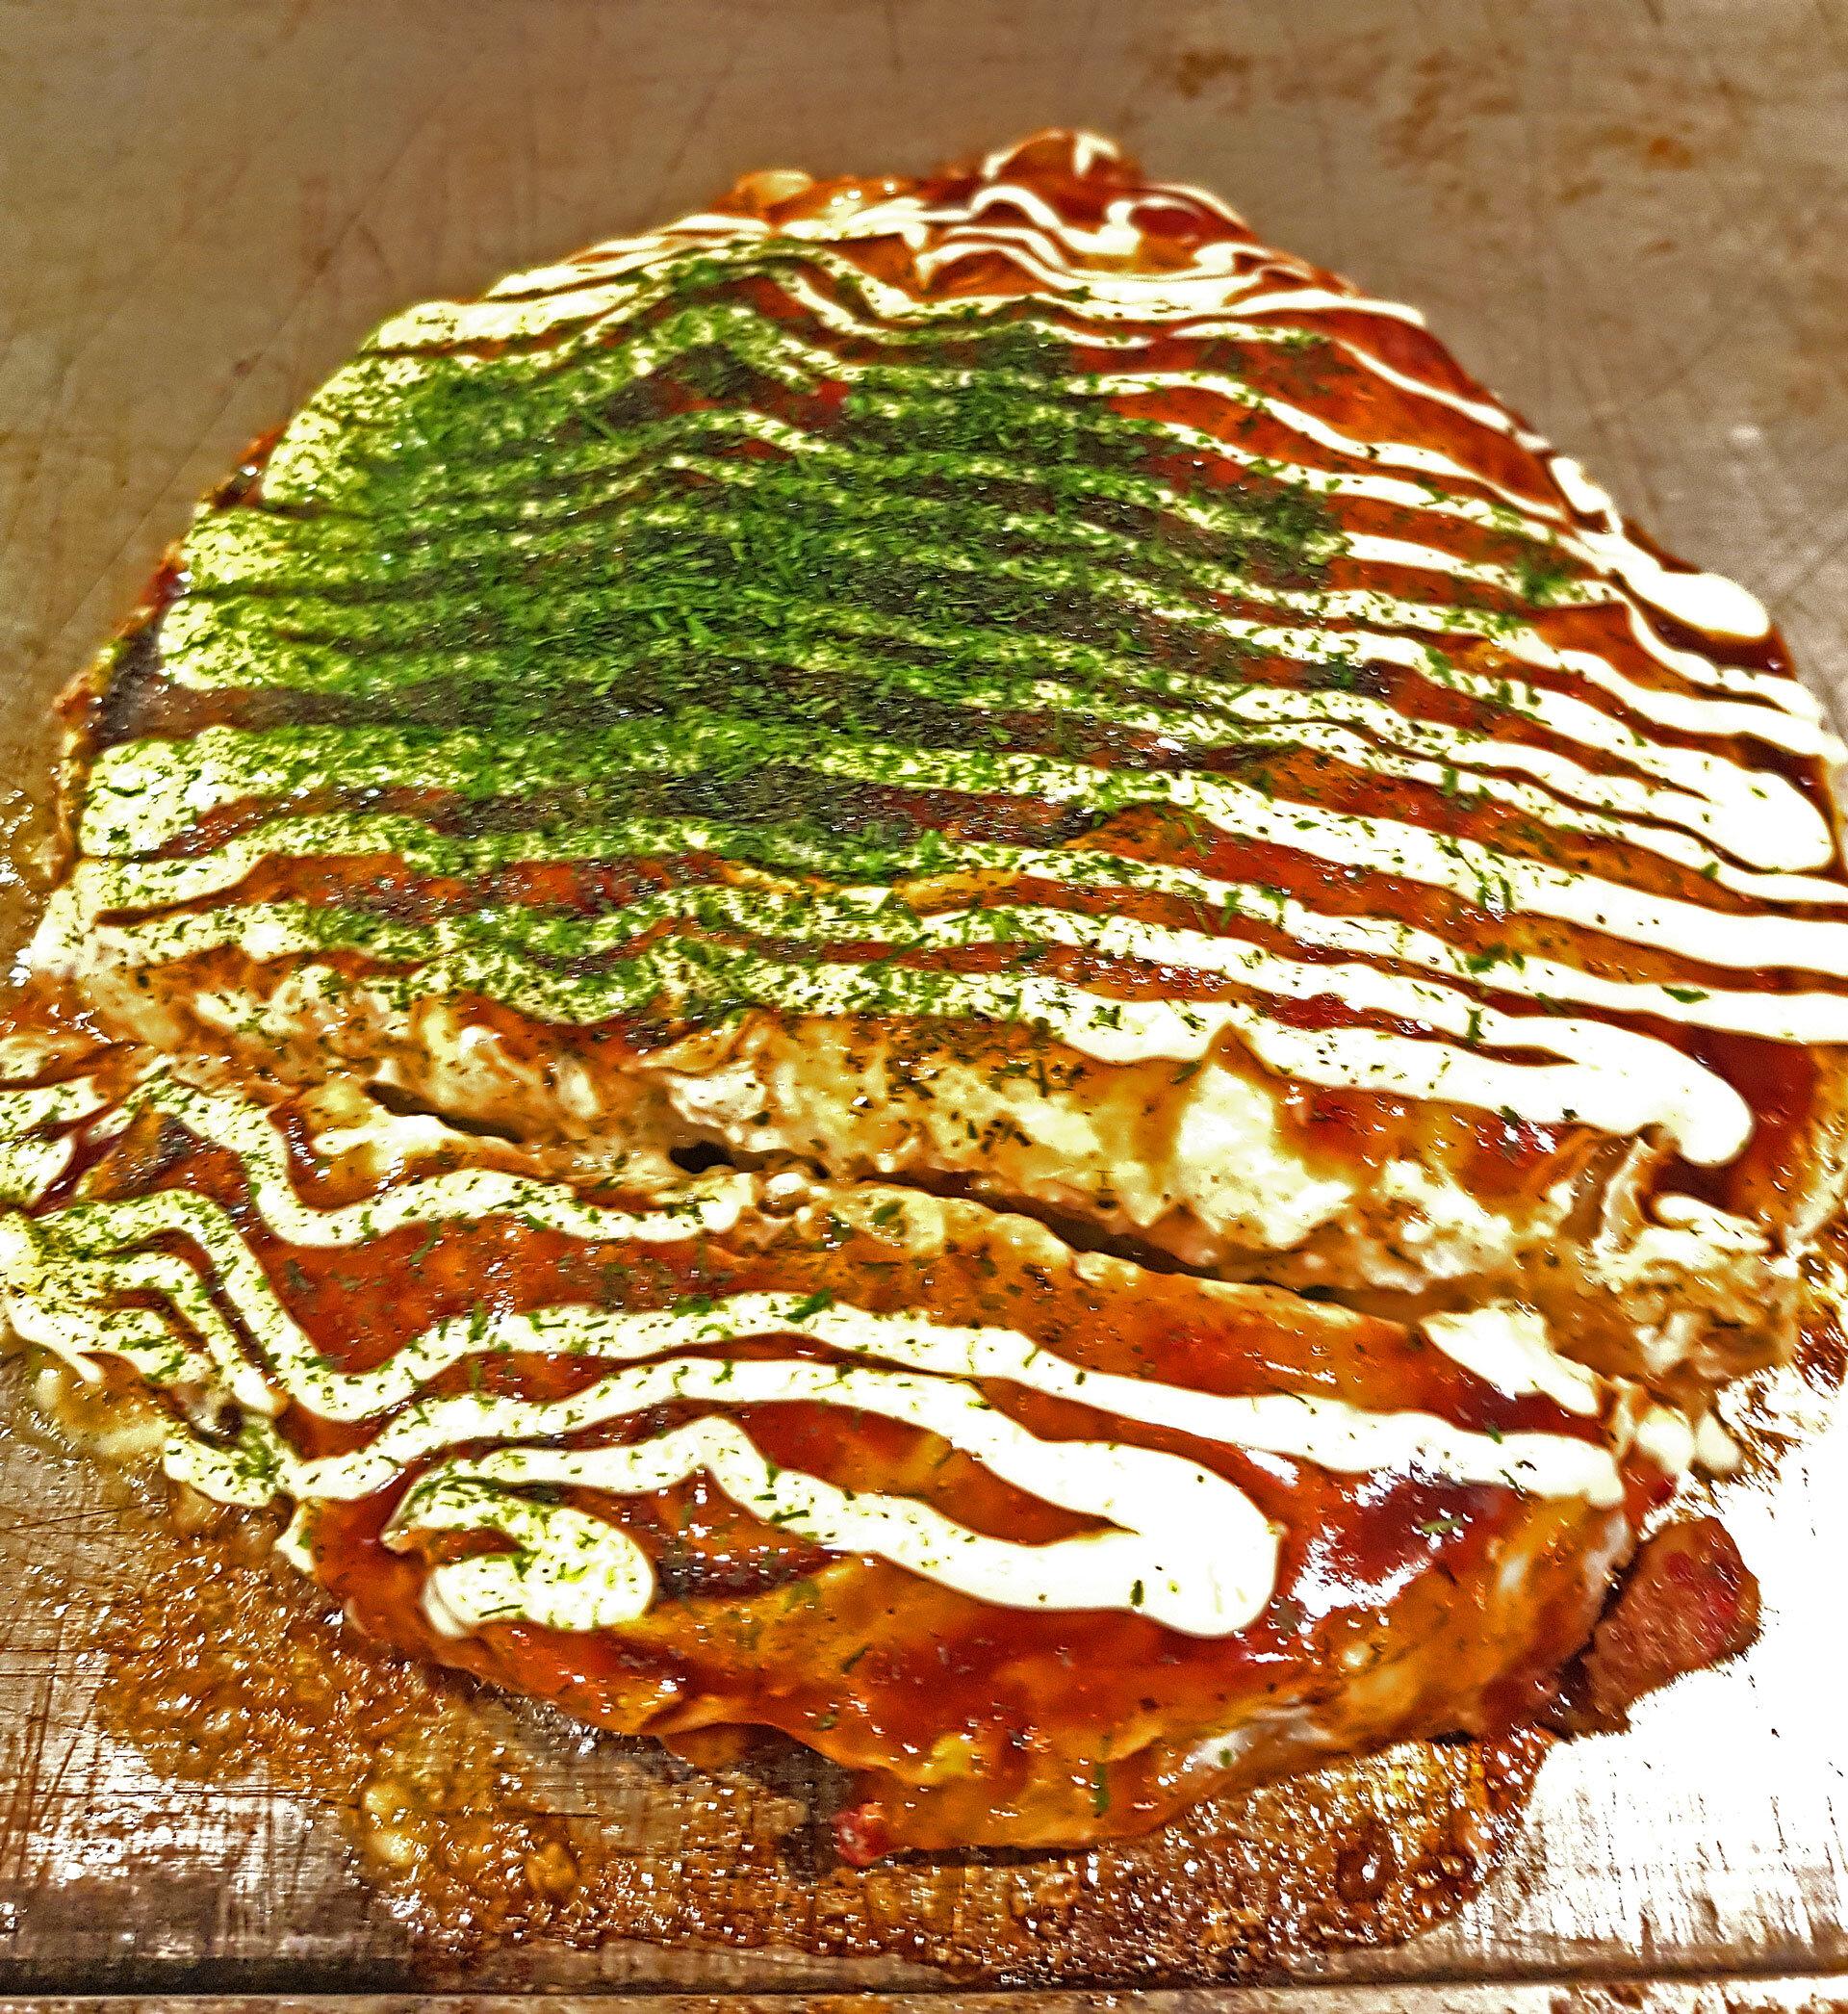 Japanese street food, Okonomiyaki.